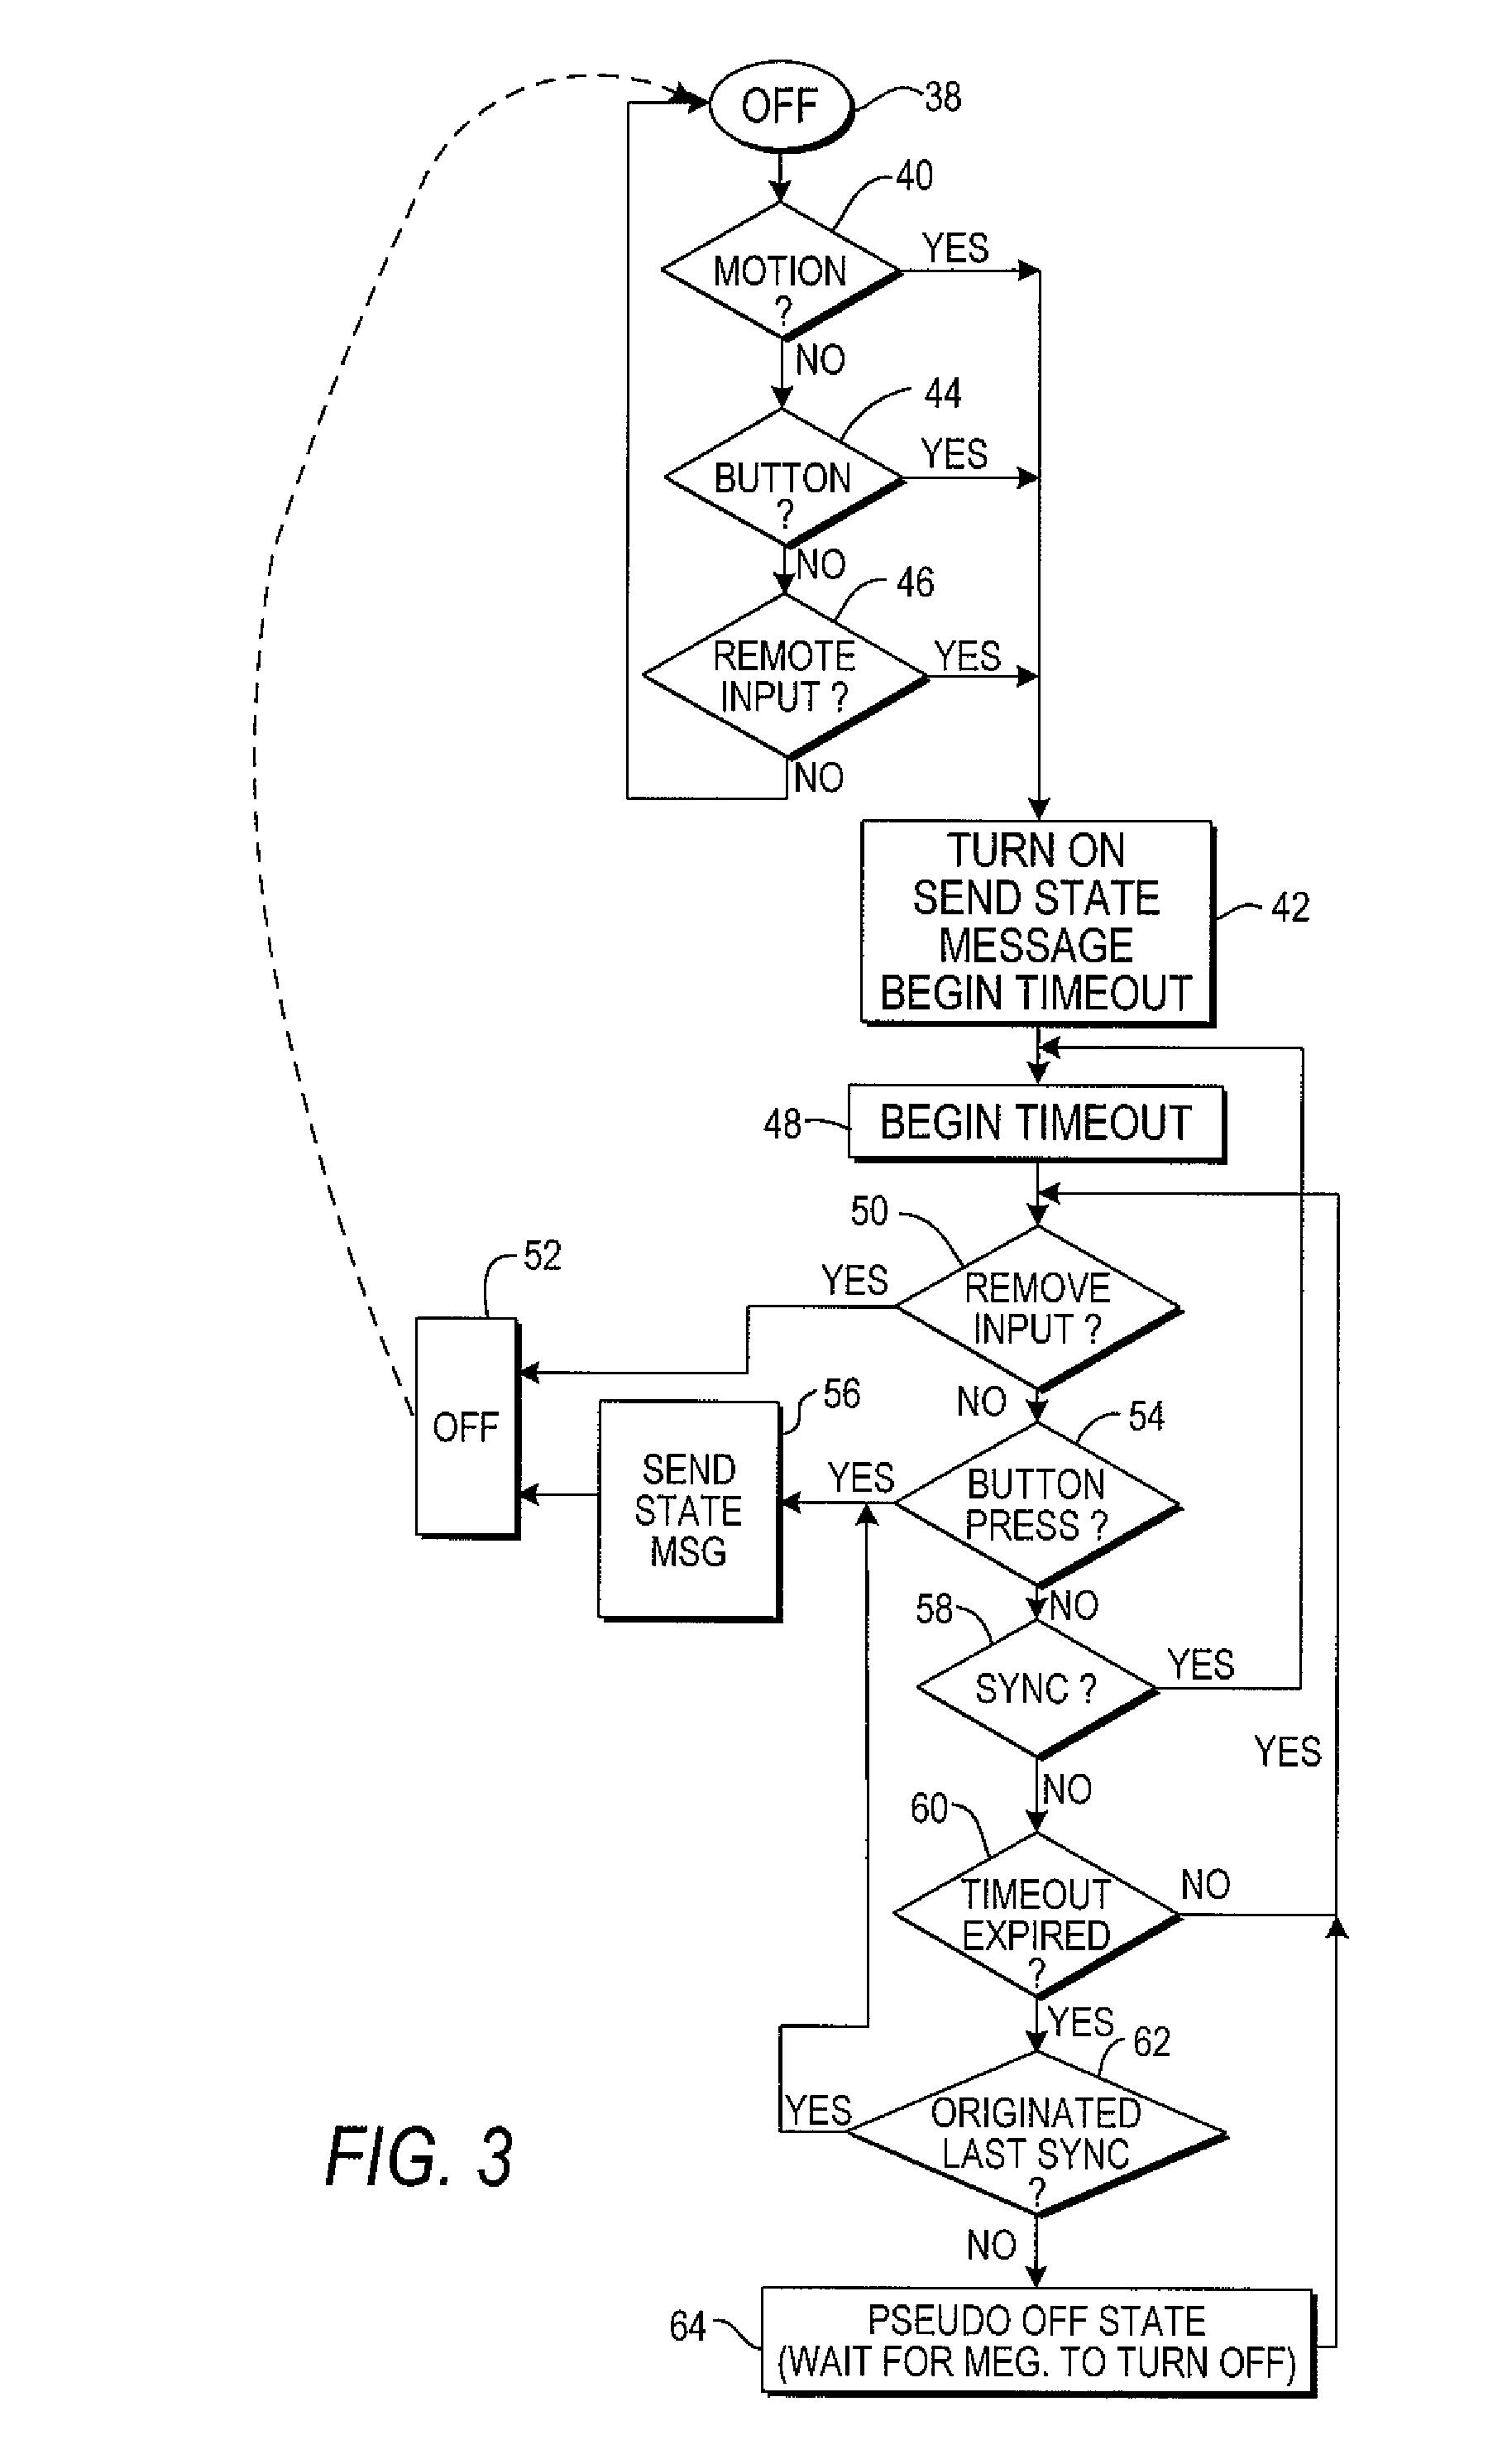 Ceiling Mount Occupancy Sensor Wiring Diagram : 45 Wiring